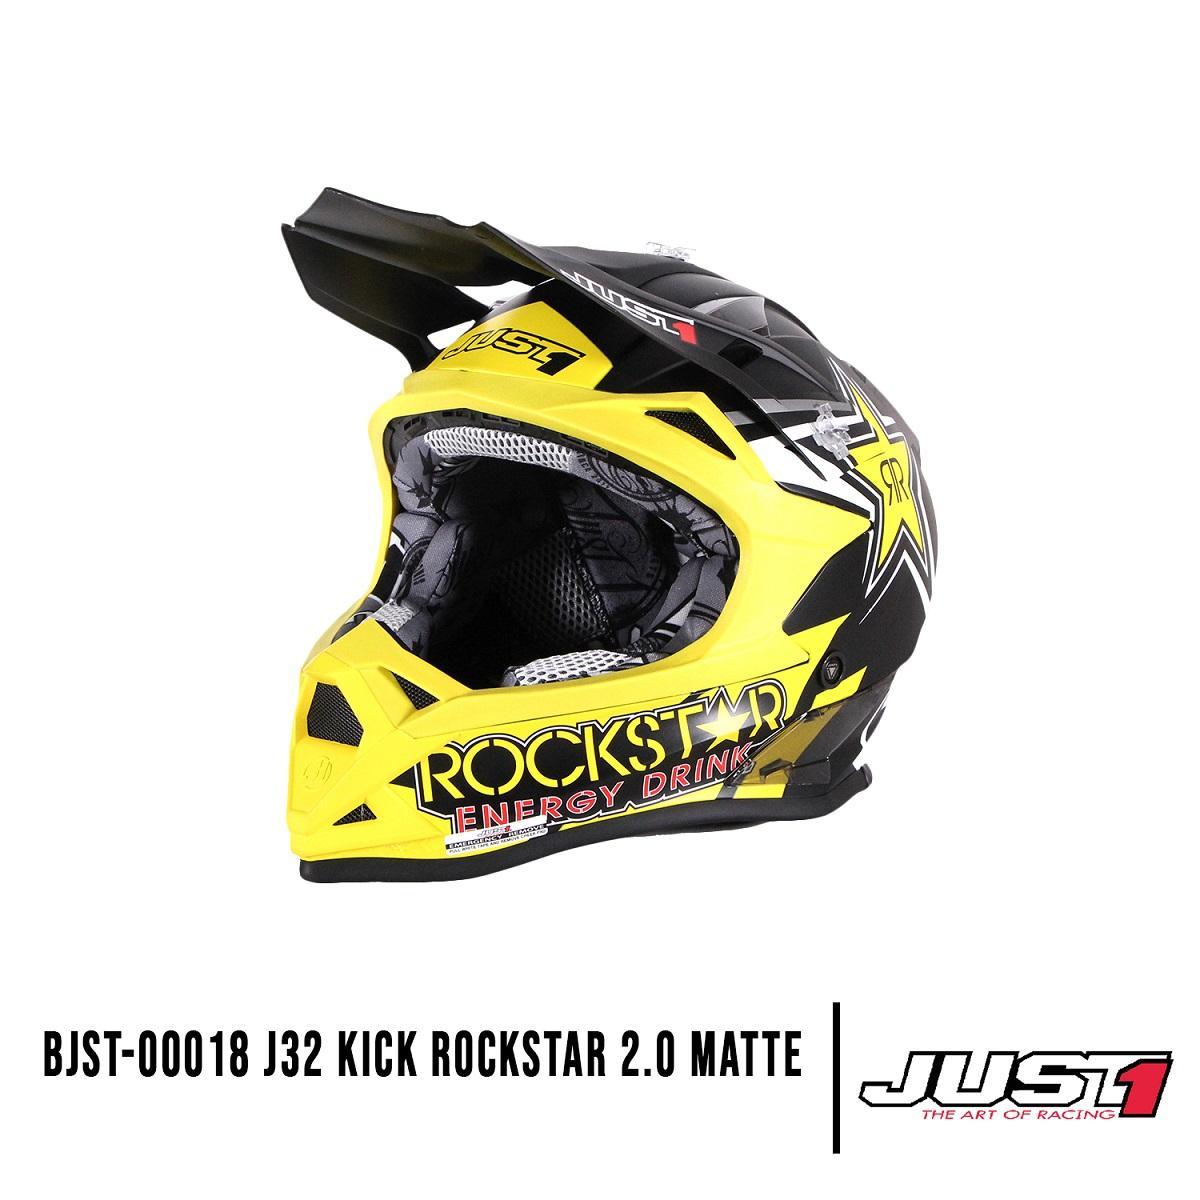 f5c83c7f Product details of BJST 00018 JUST1 J32 PRO ROCKSTAR 2.0 Matte Motocross  Helmet